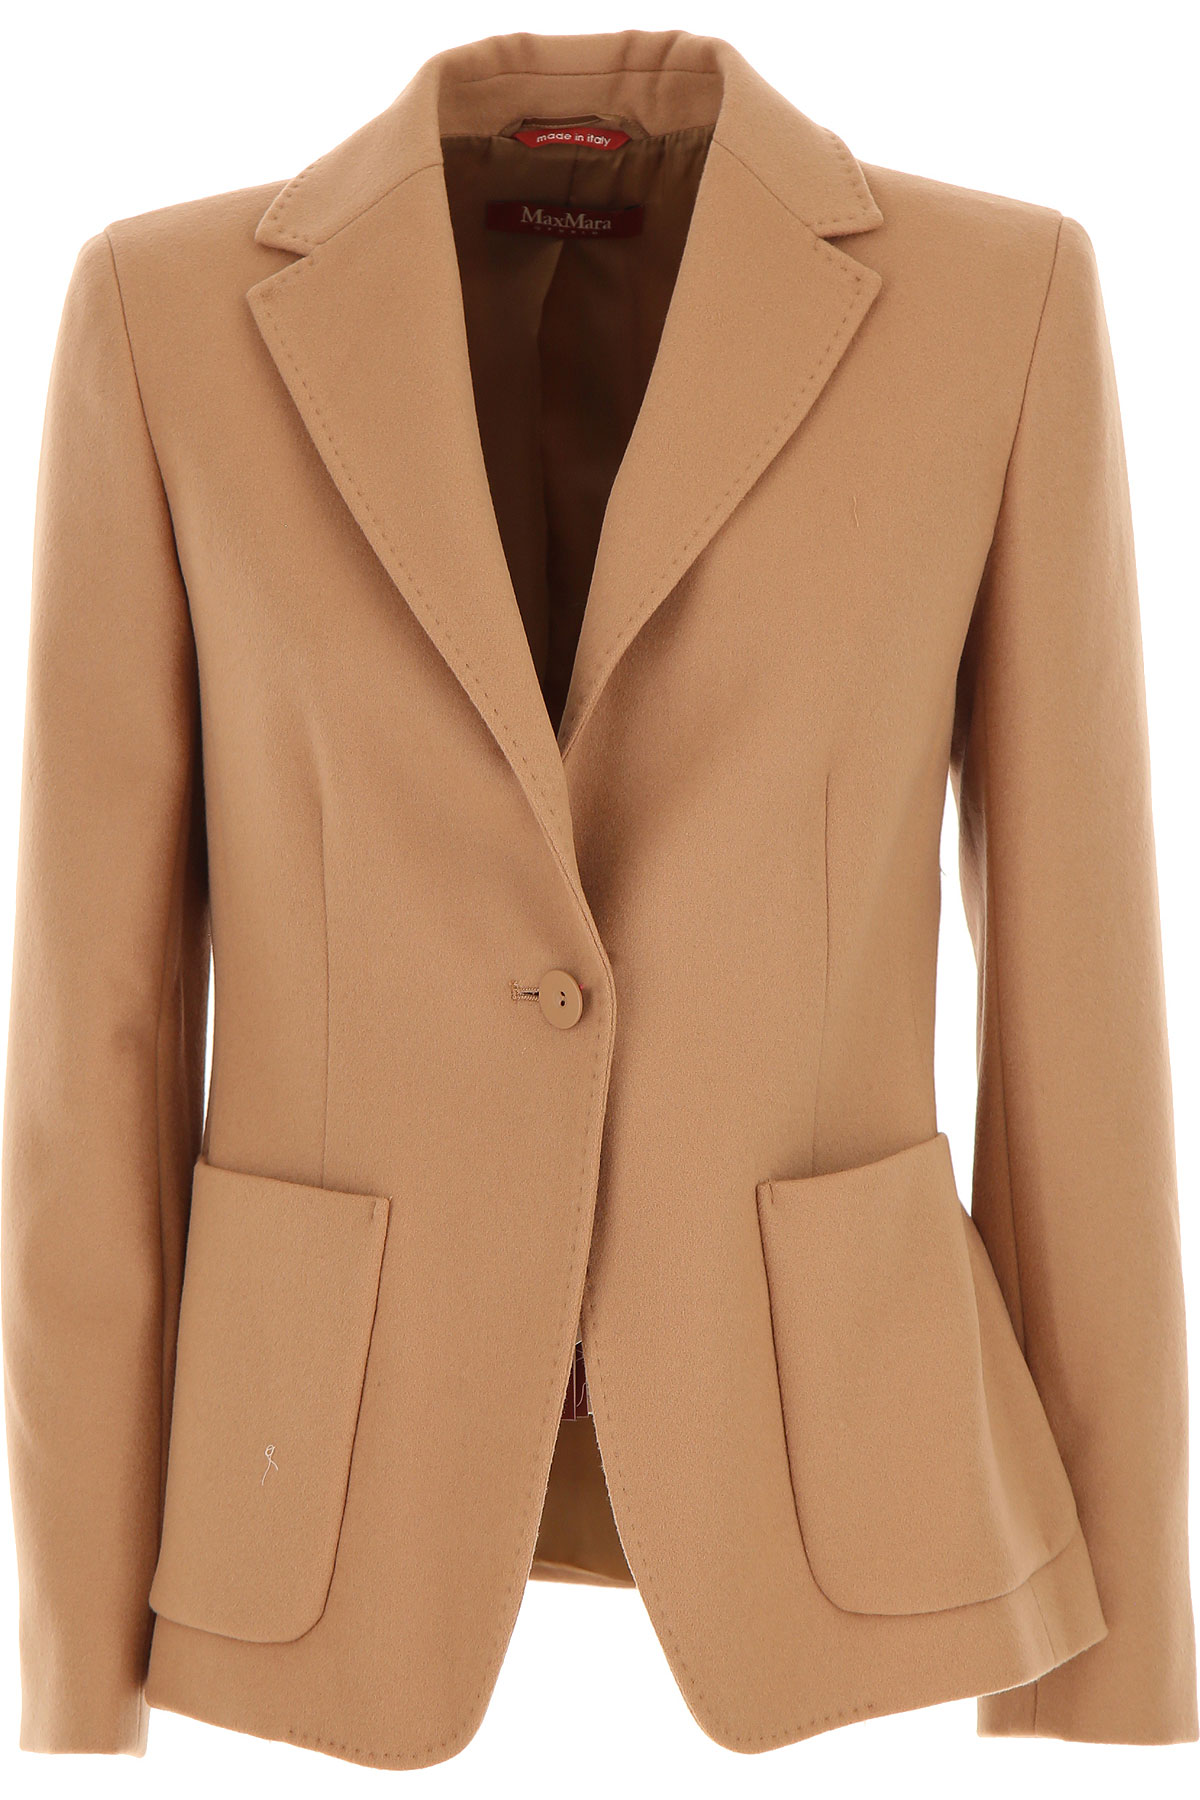 Max Mara Blazer for Women On Sale, Caramel, Wool, 2019, 4 6